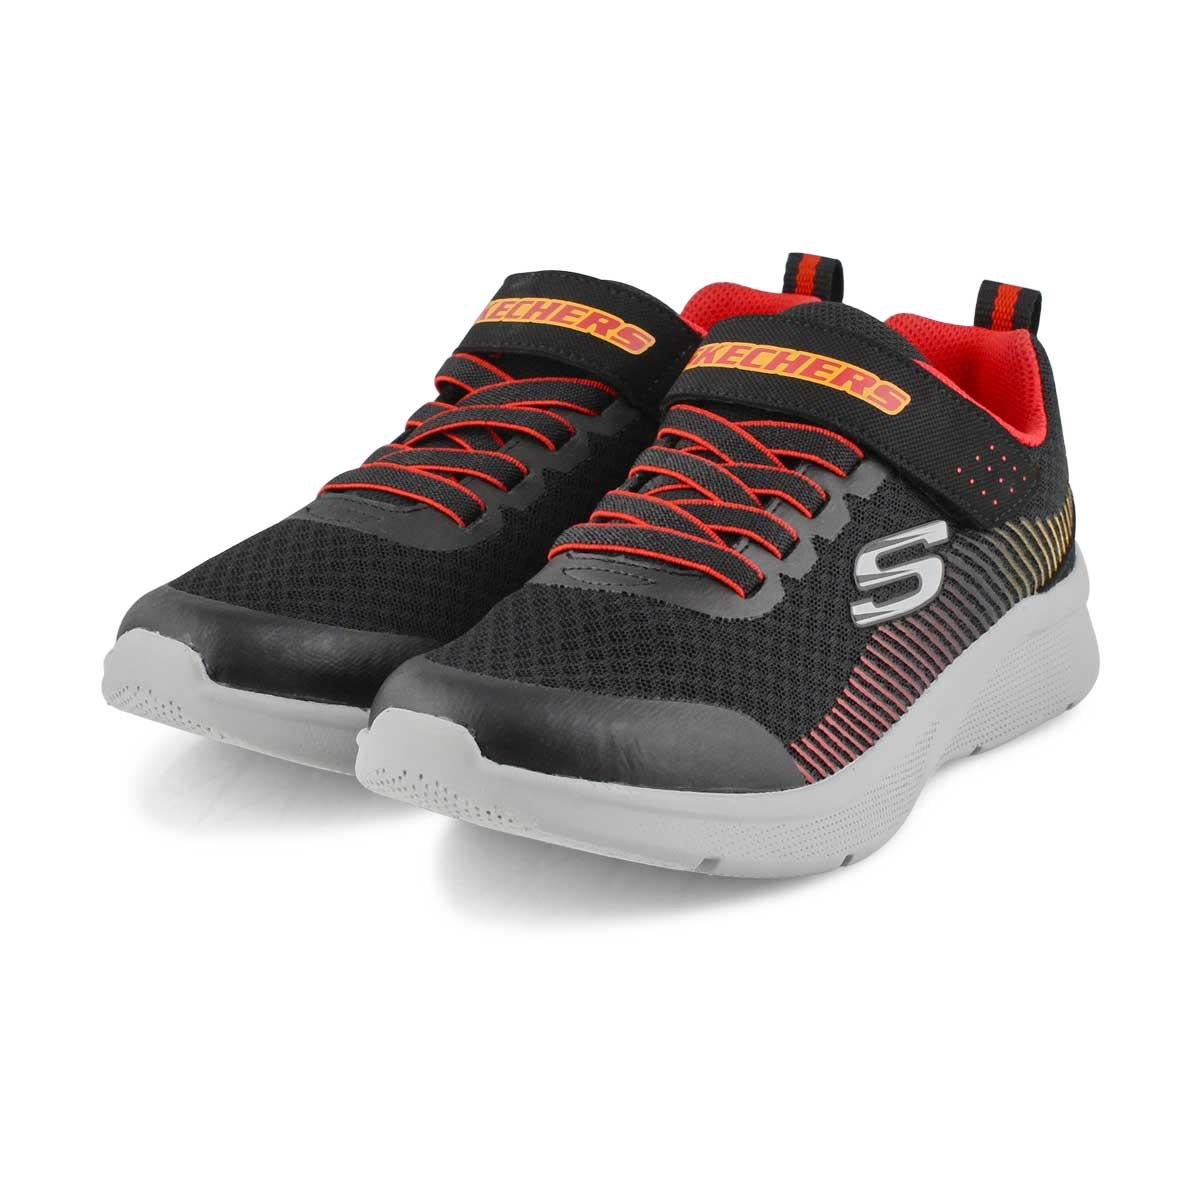 Bys Microspec blk/red sneaker